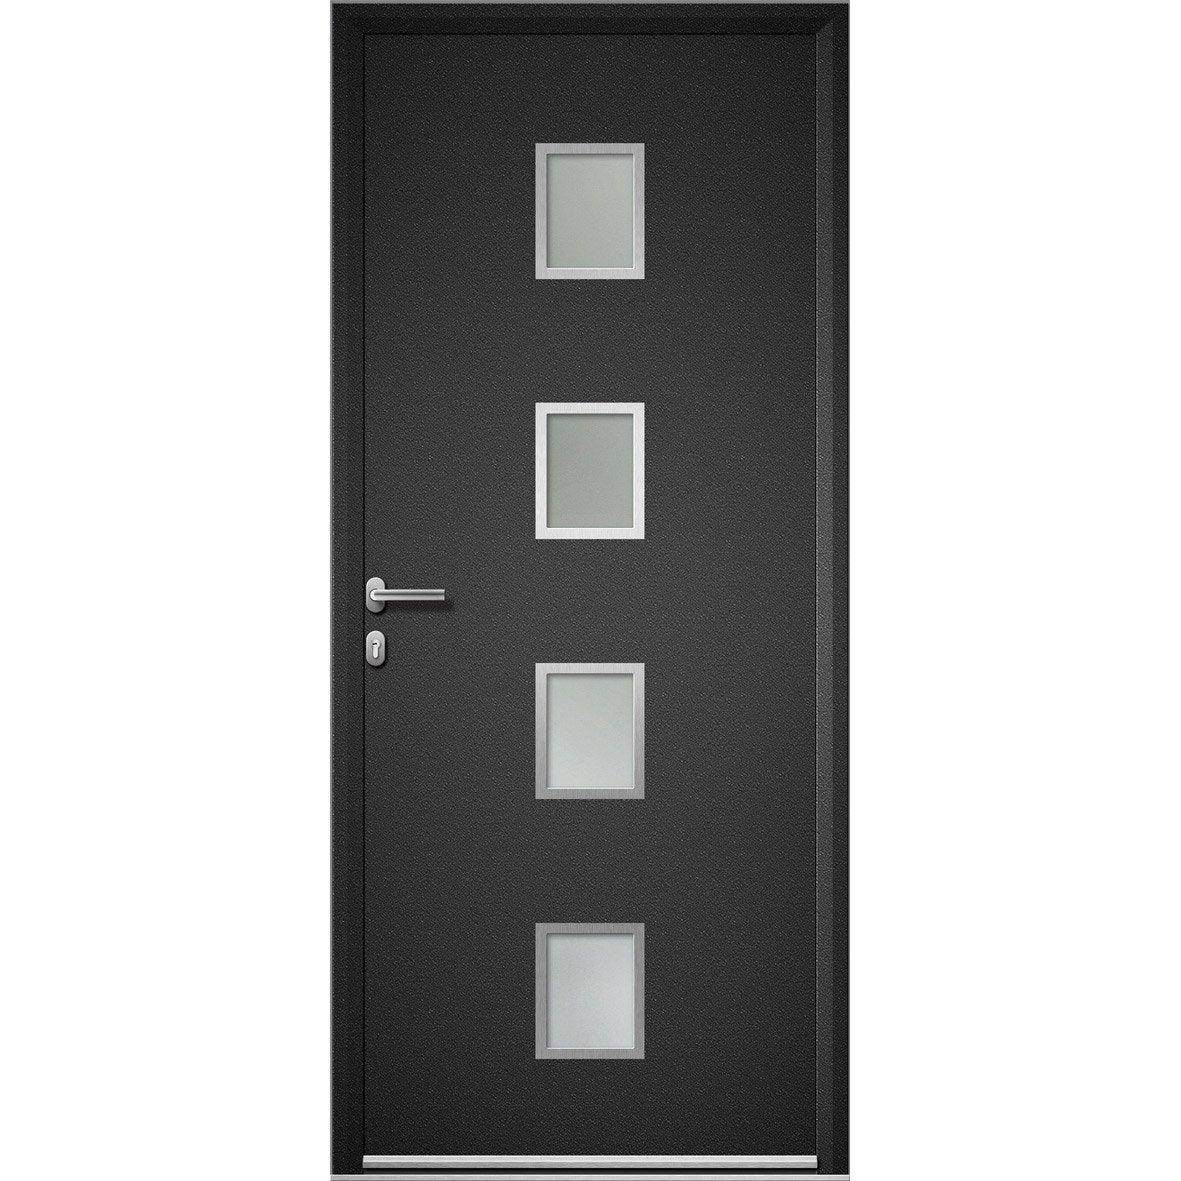 Porte d 39 entr e aluminium baltimore artens poussant gauche x c - Leroy merlin porte entree alu ...